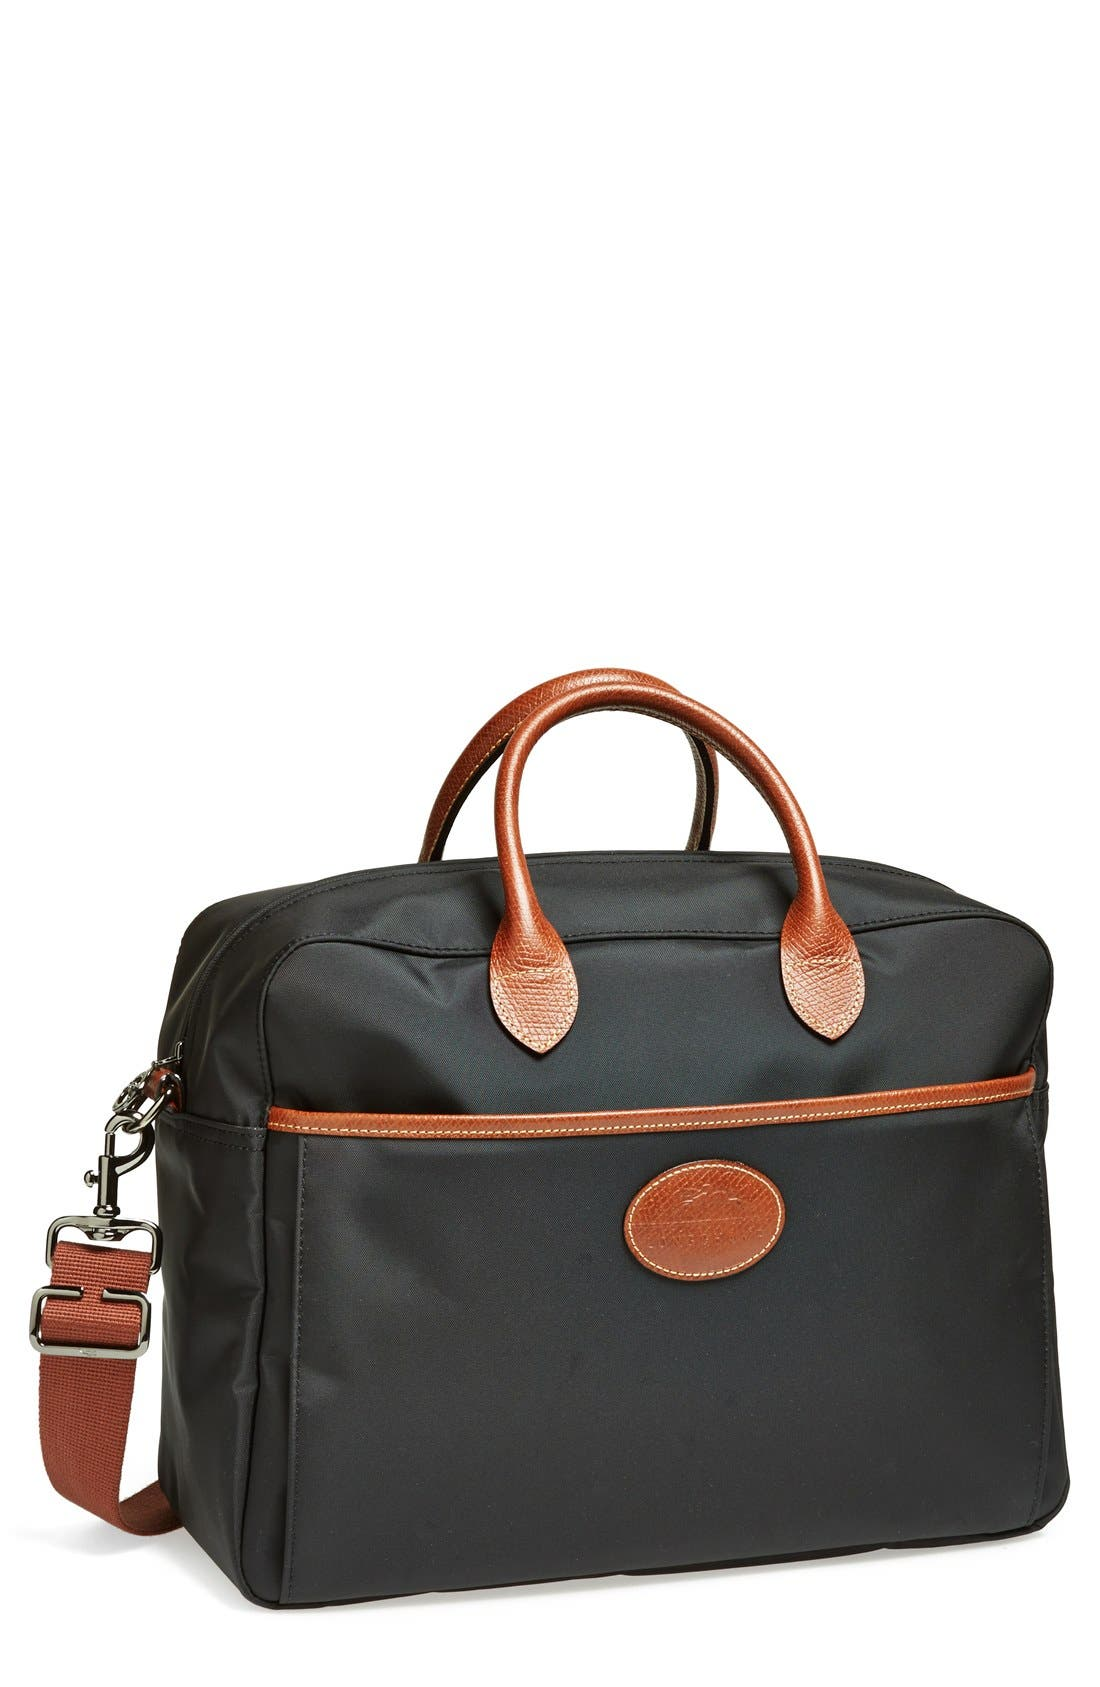 Alternate Image 1 Selected - Longchamp 'Le Pliage' Travel Bag (14 Inch)